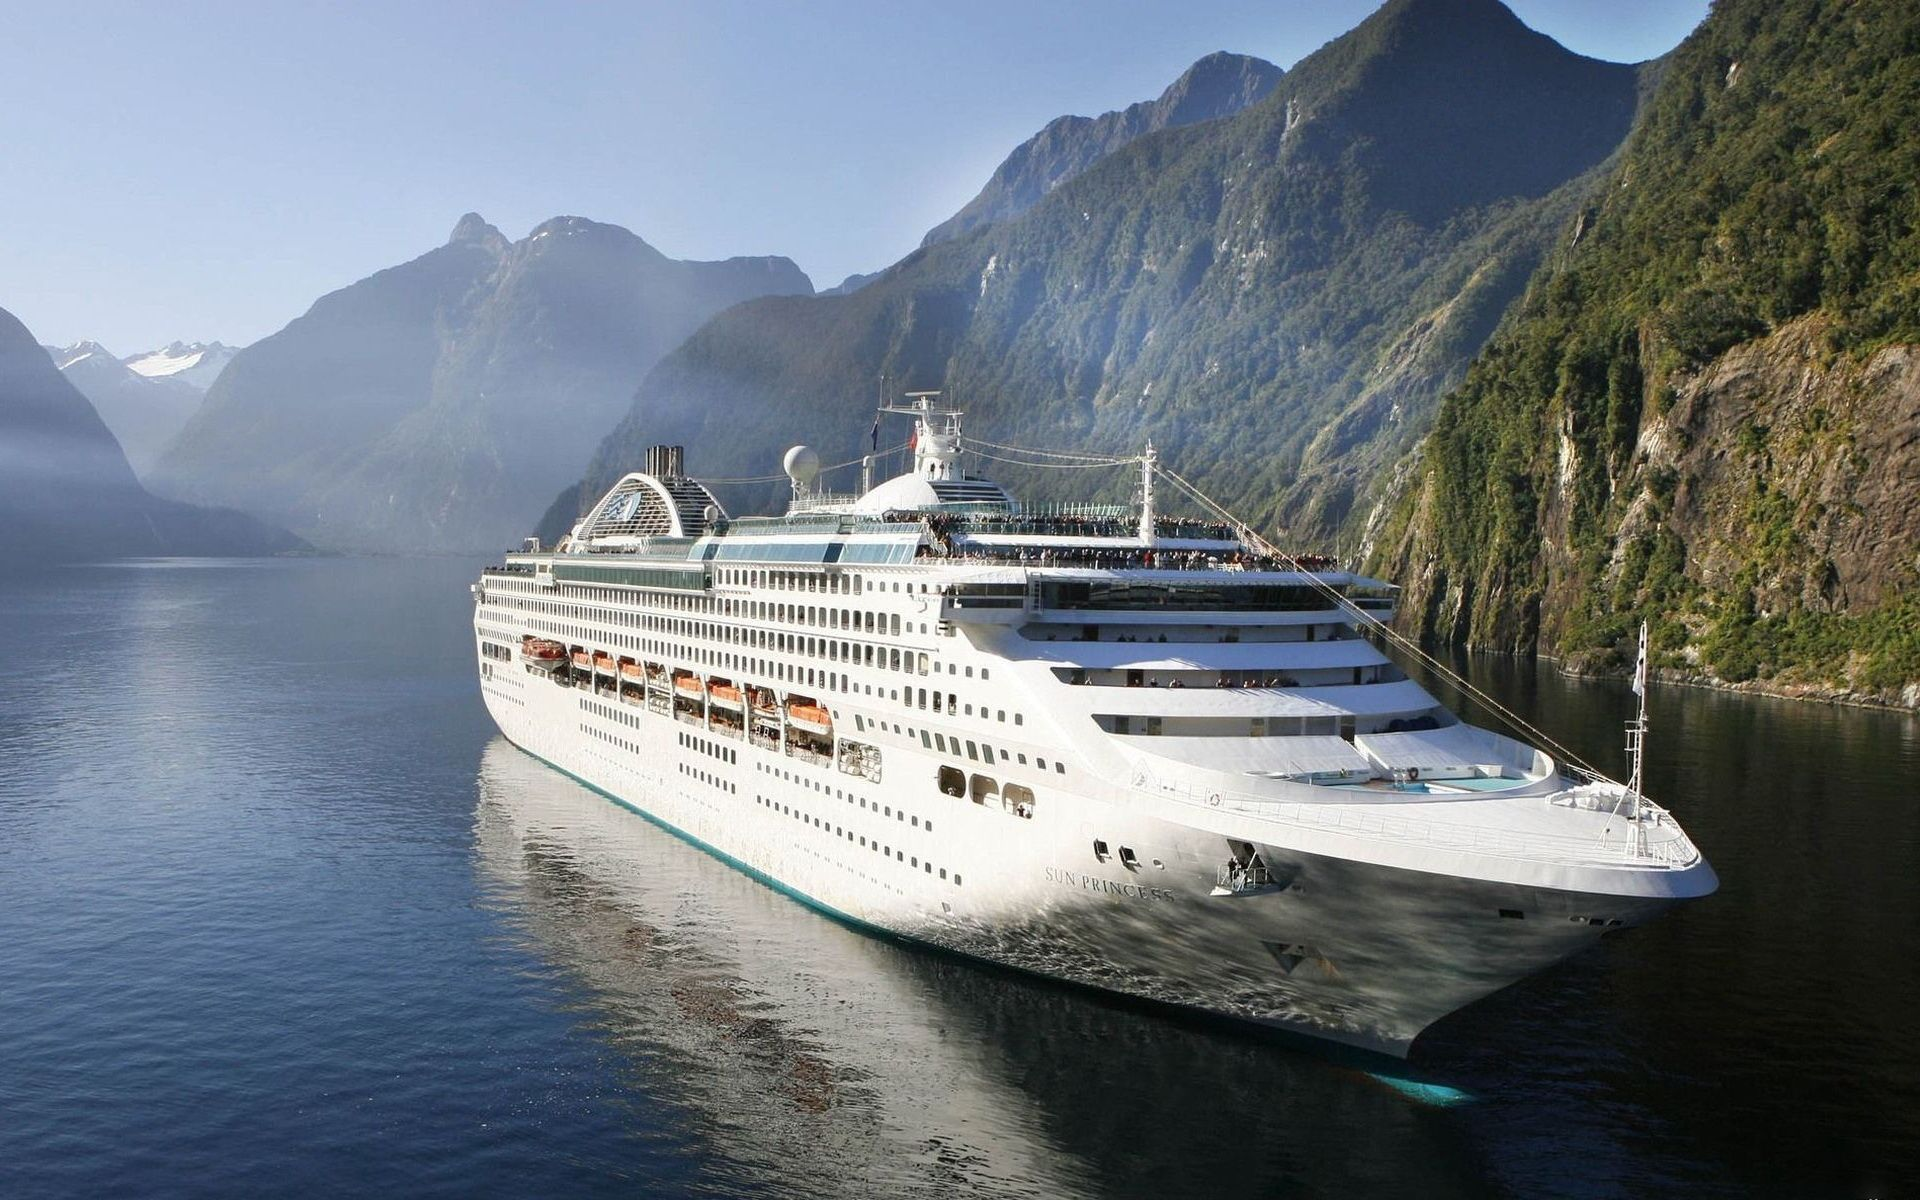 Cruise Ship Sun Princess Boat HD Wallpapers Pinterest Cruise - Cheap cruises com